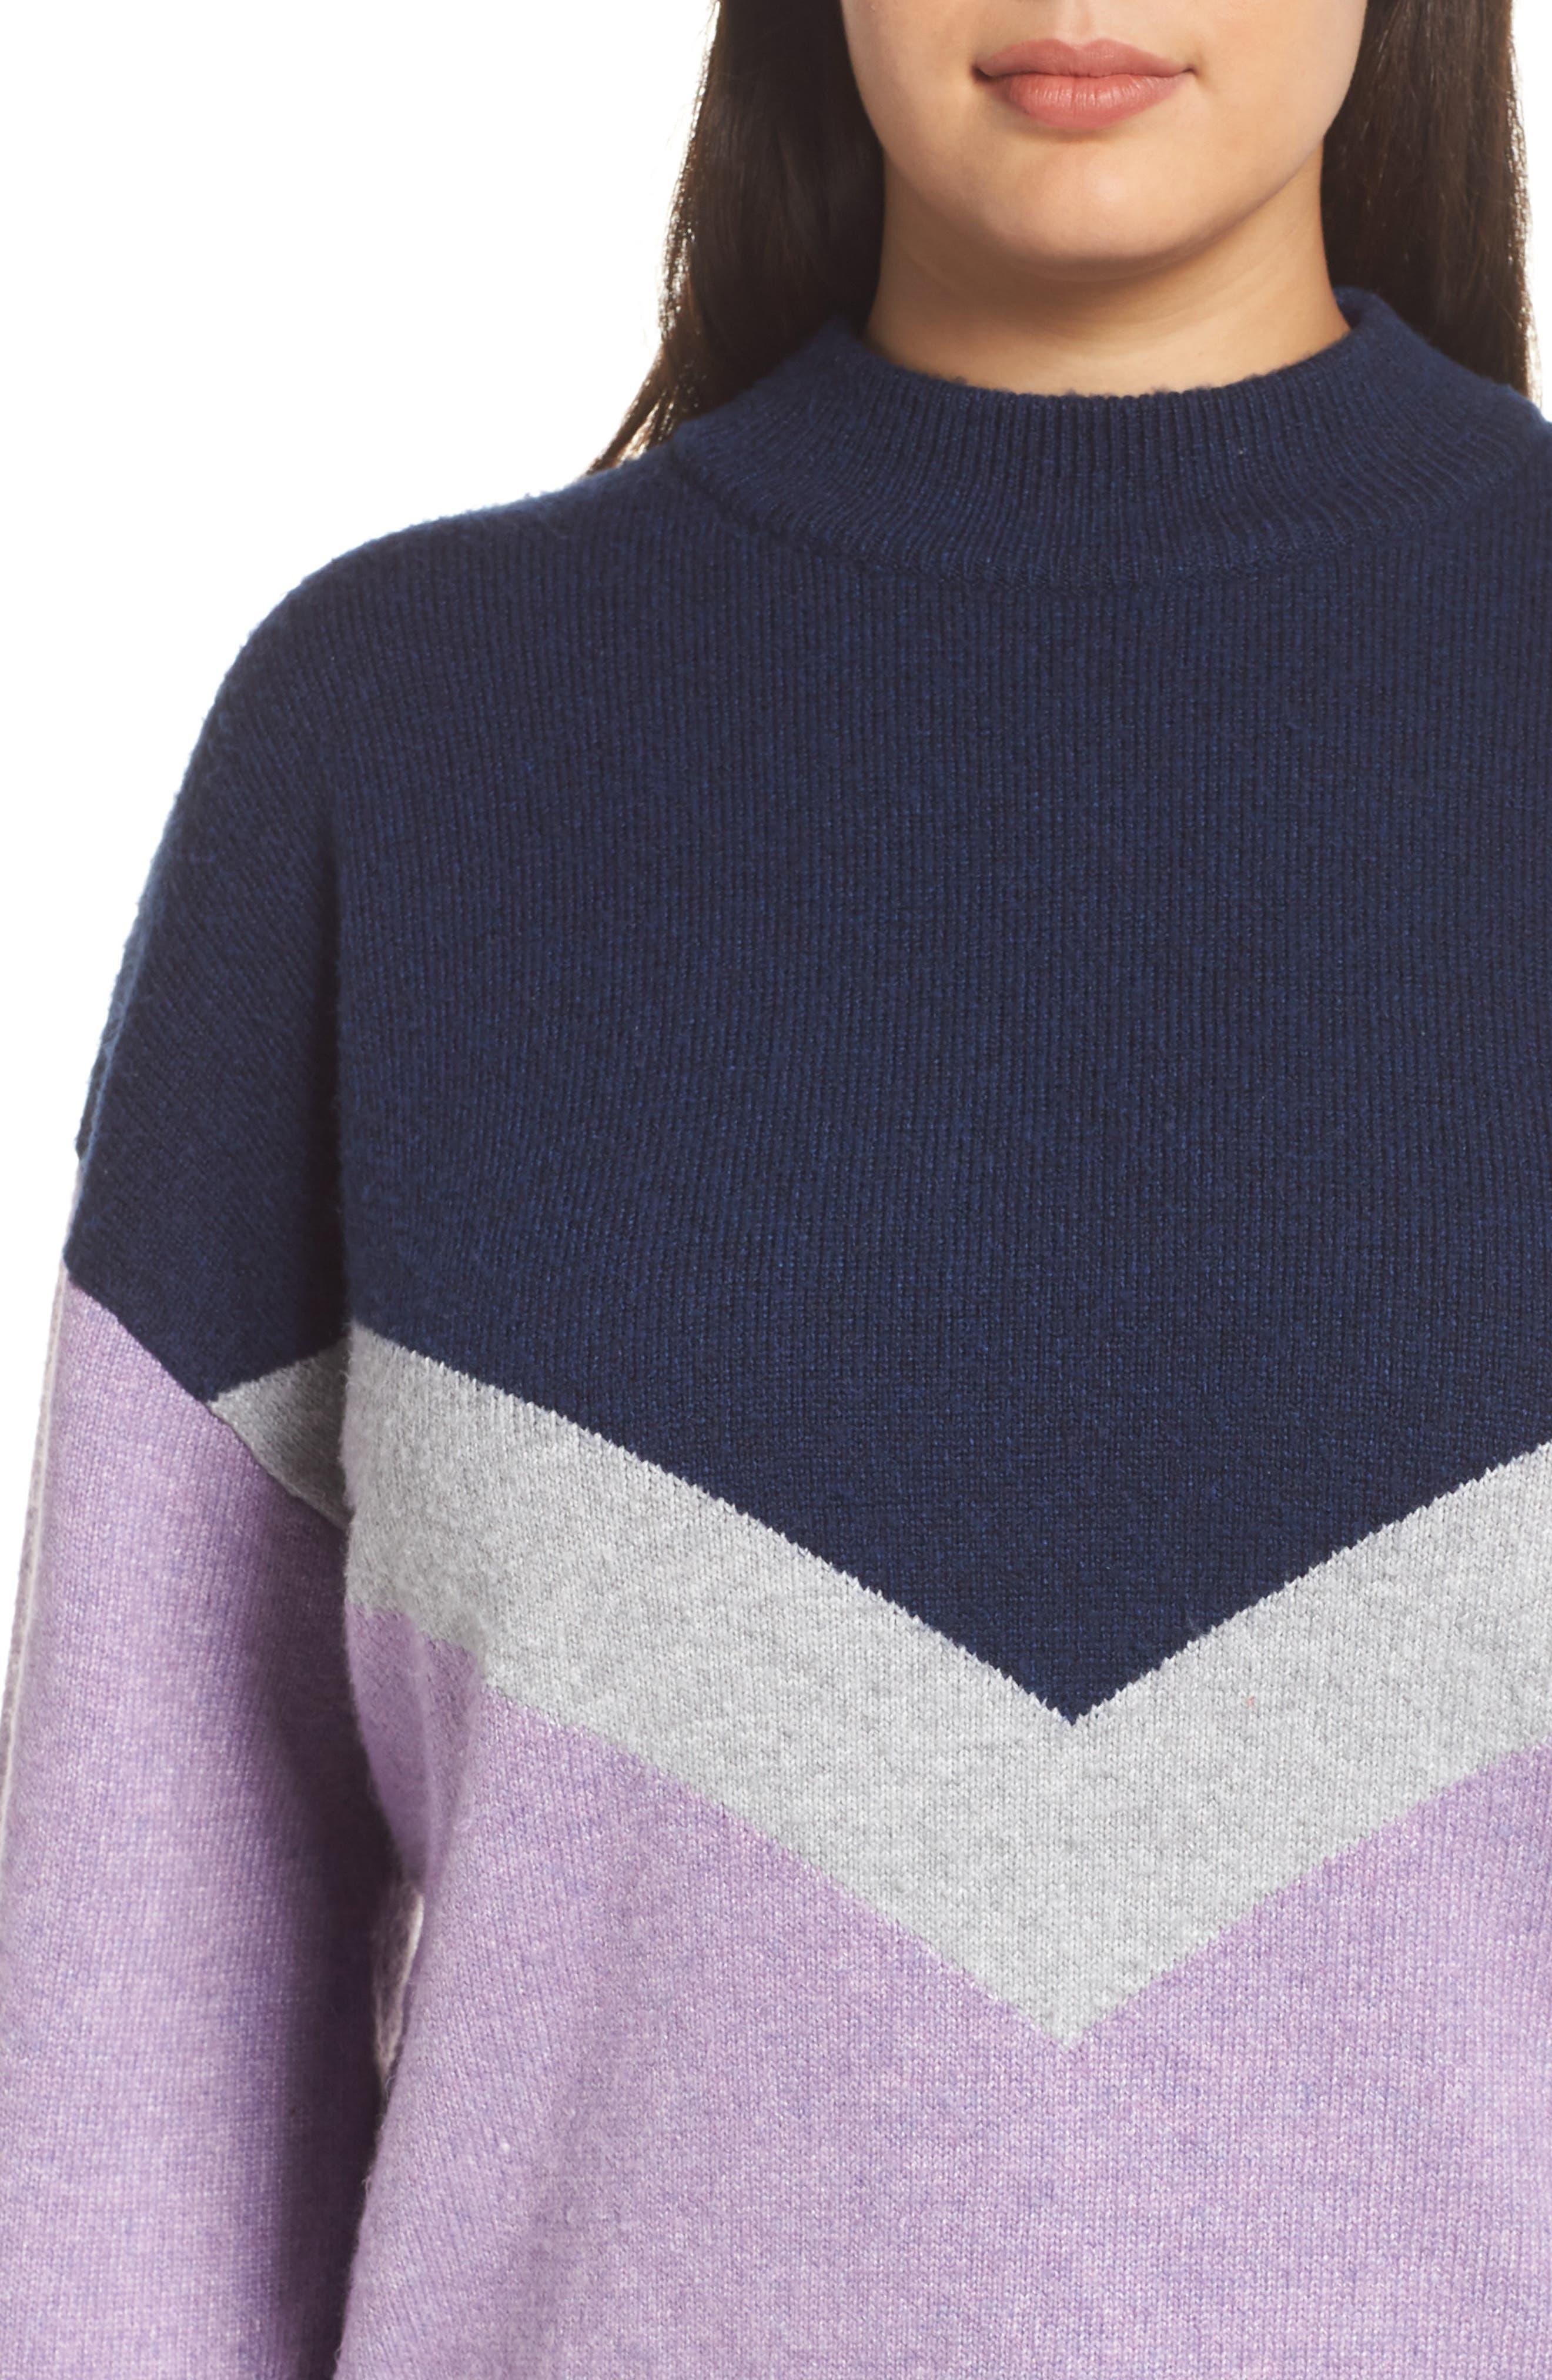 Chevron Stripe Sweater,                             Alternate thumbnail 4, color,                             PURPLE WAVE CHALET